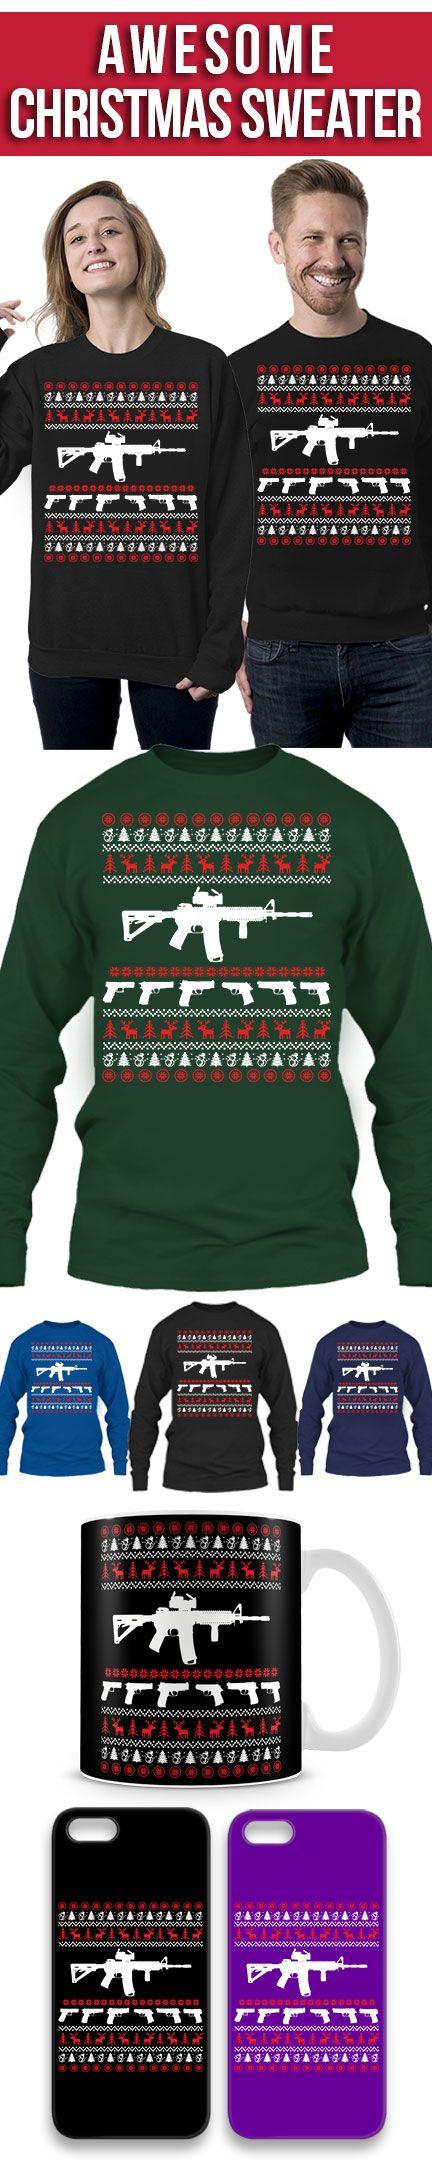 153 best Gift ideas images on Pinterest   Christmas gift ideas ...